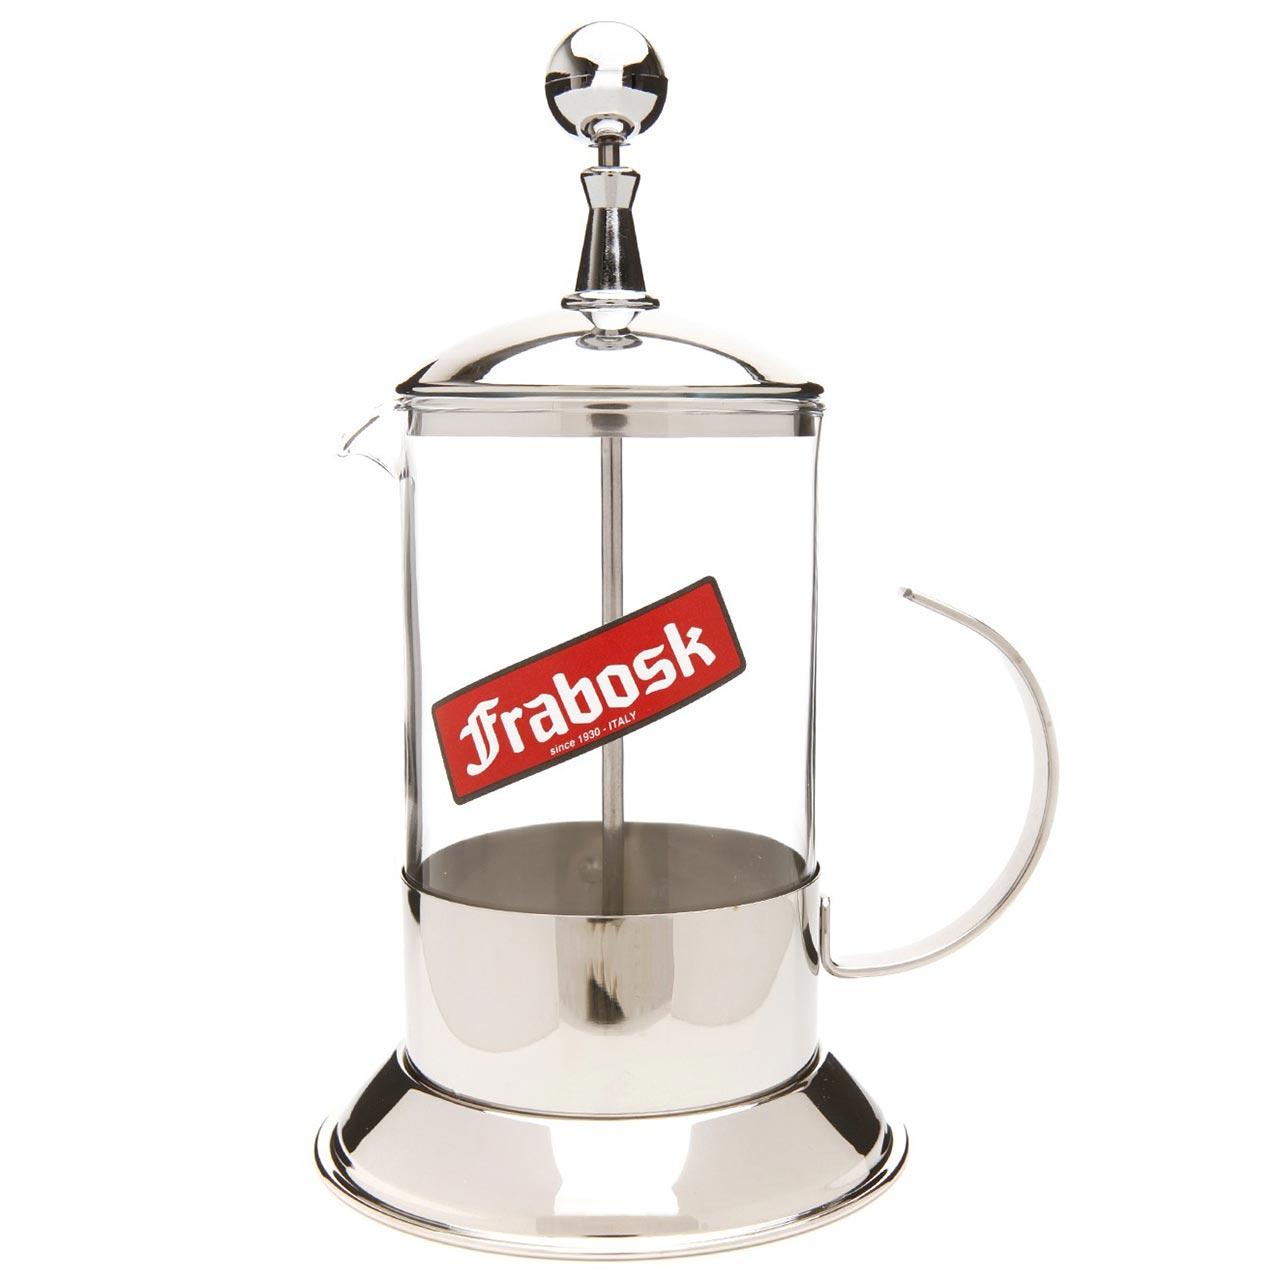 FRABOSK Vintage Cafetiere Coffee or Tea Plunger 8 Cup | the design gift shop